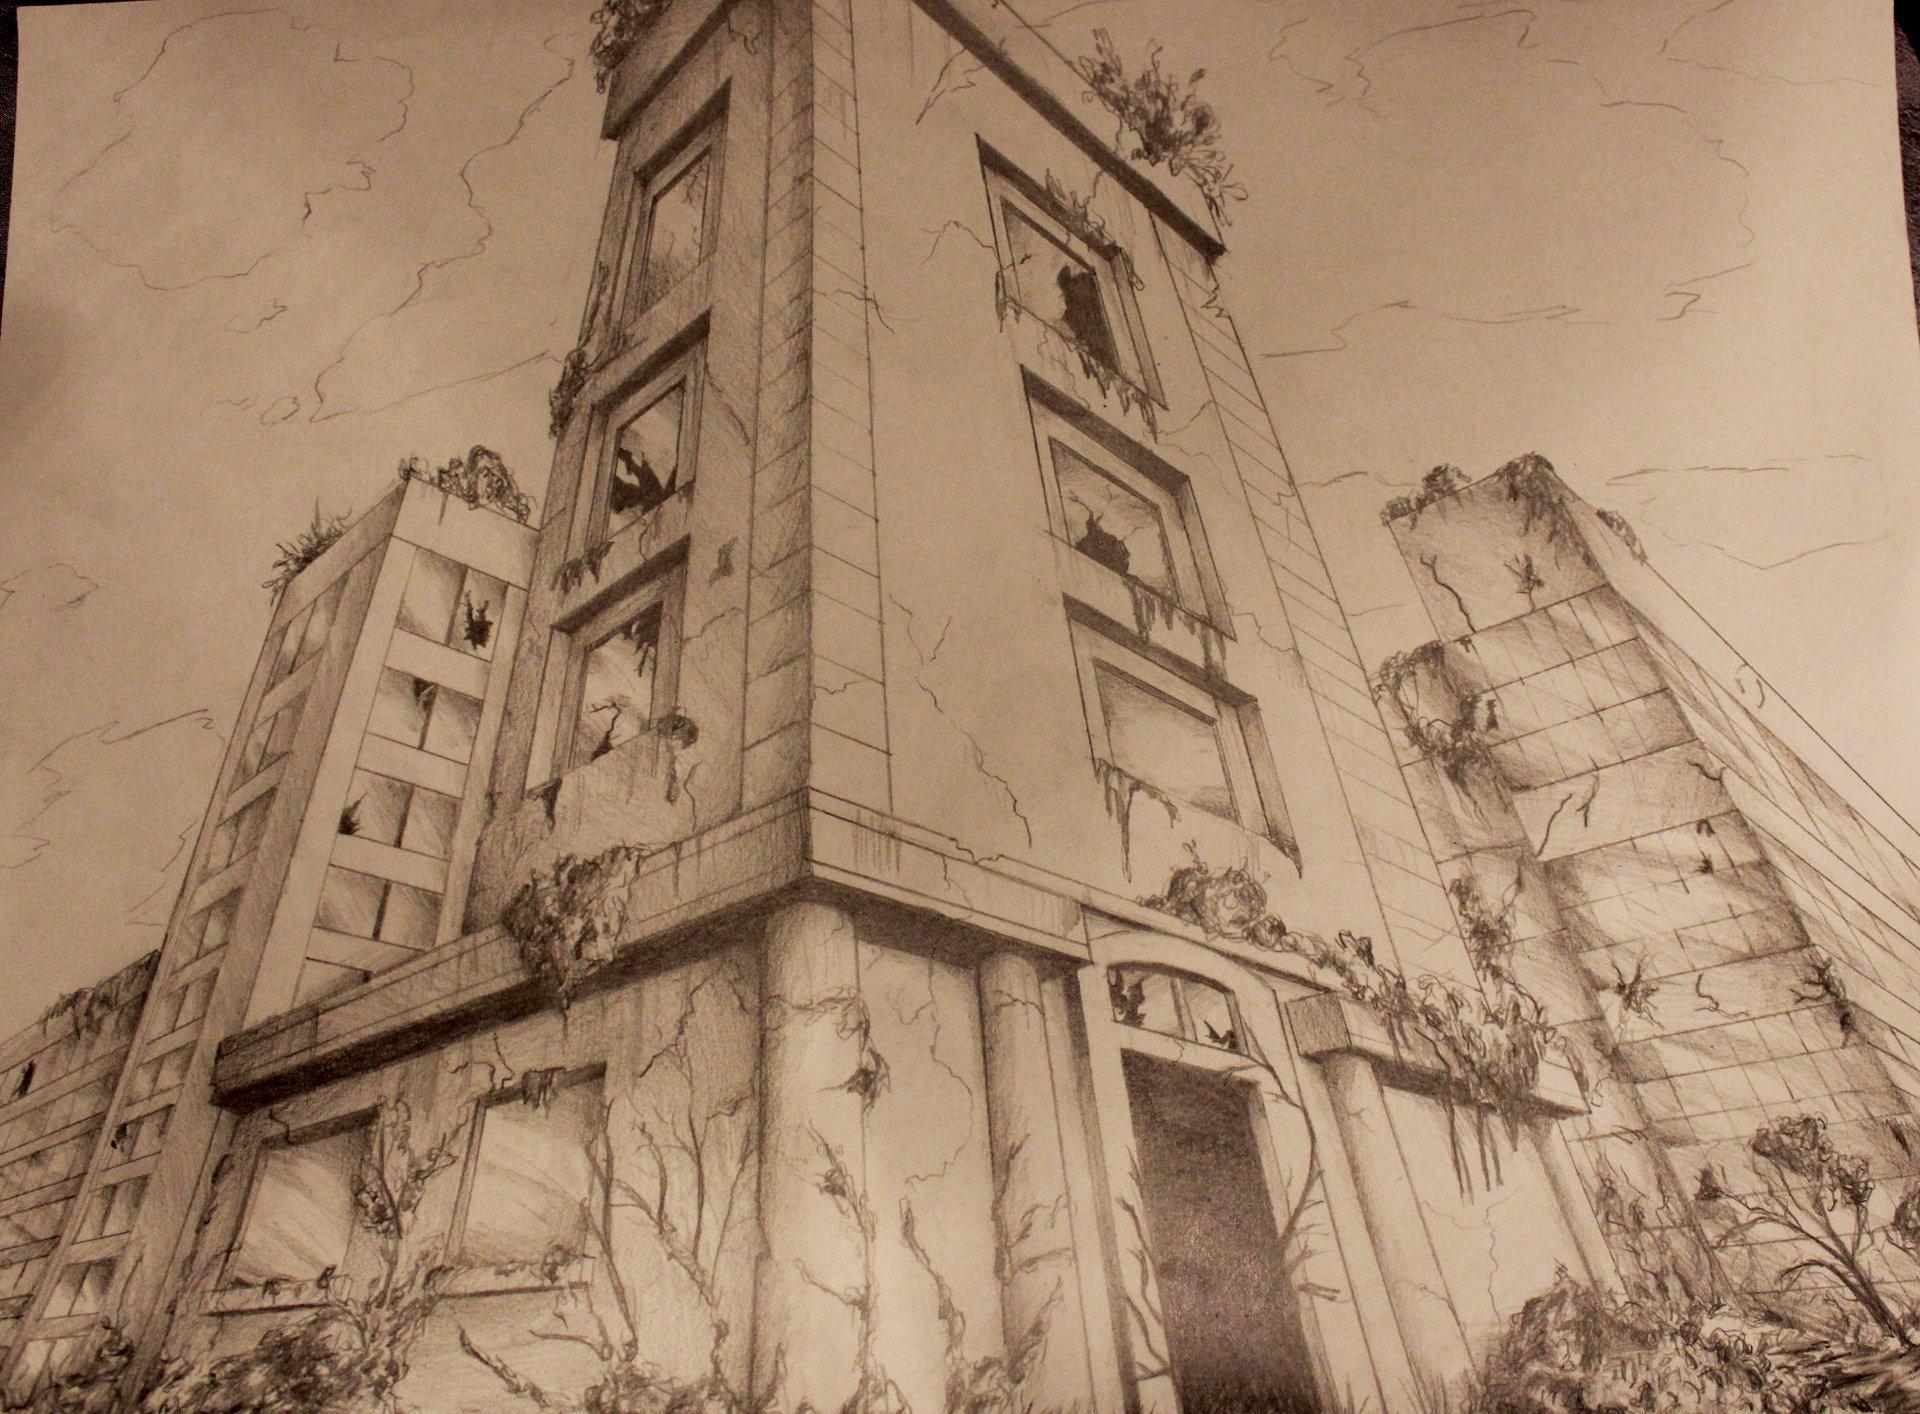 Anouchka Strauven - Post apocalyptic city